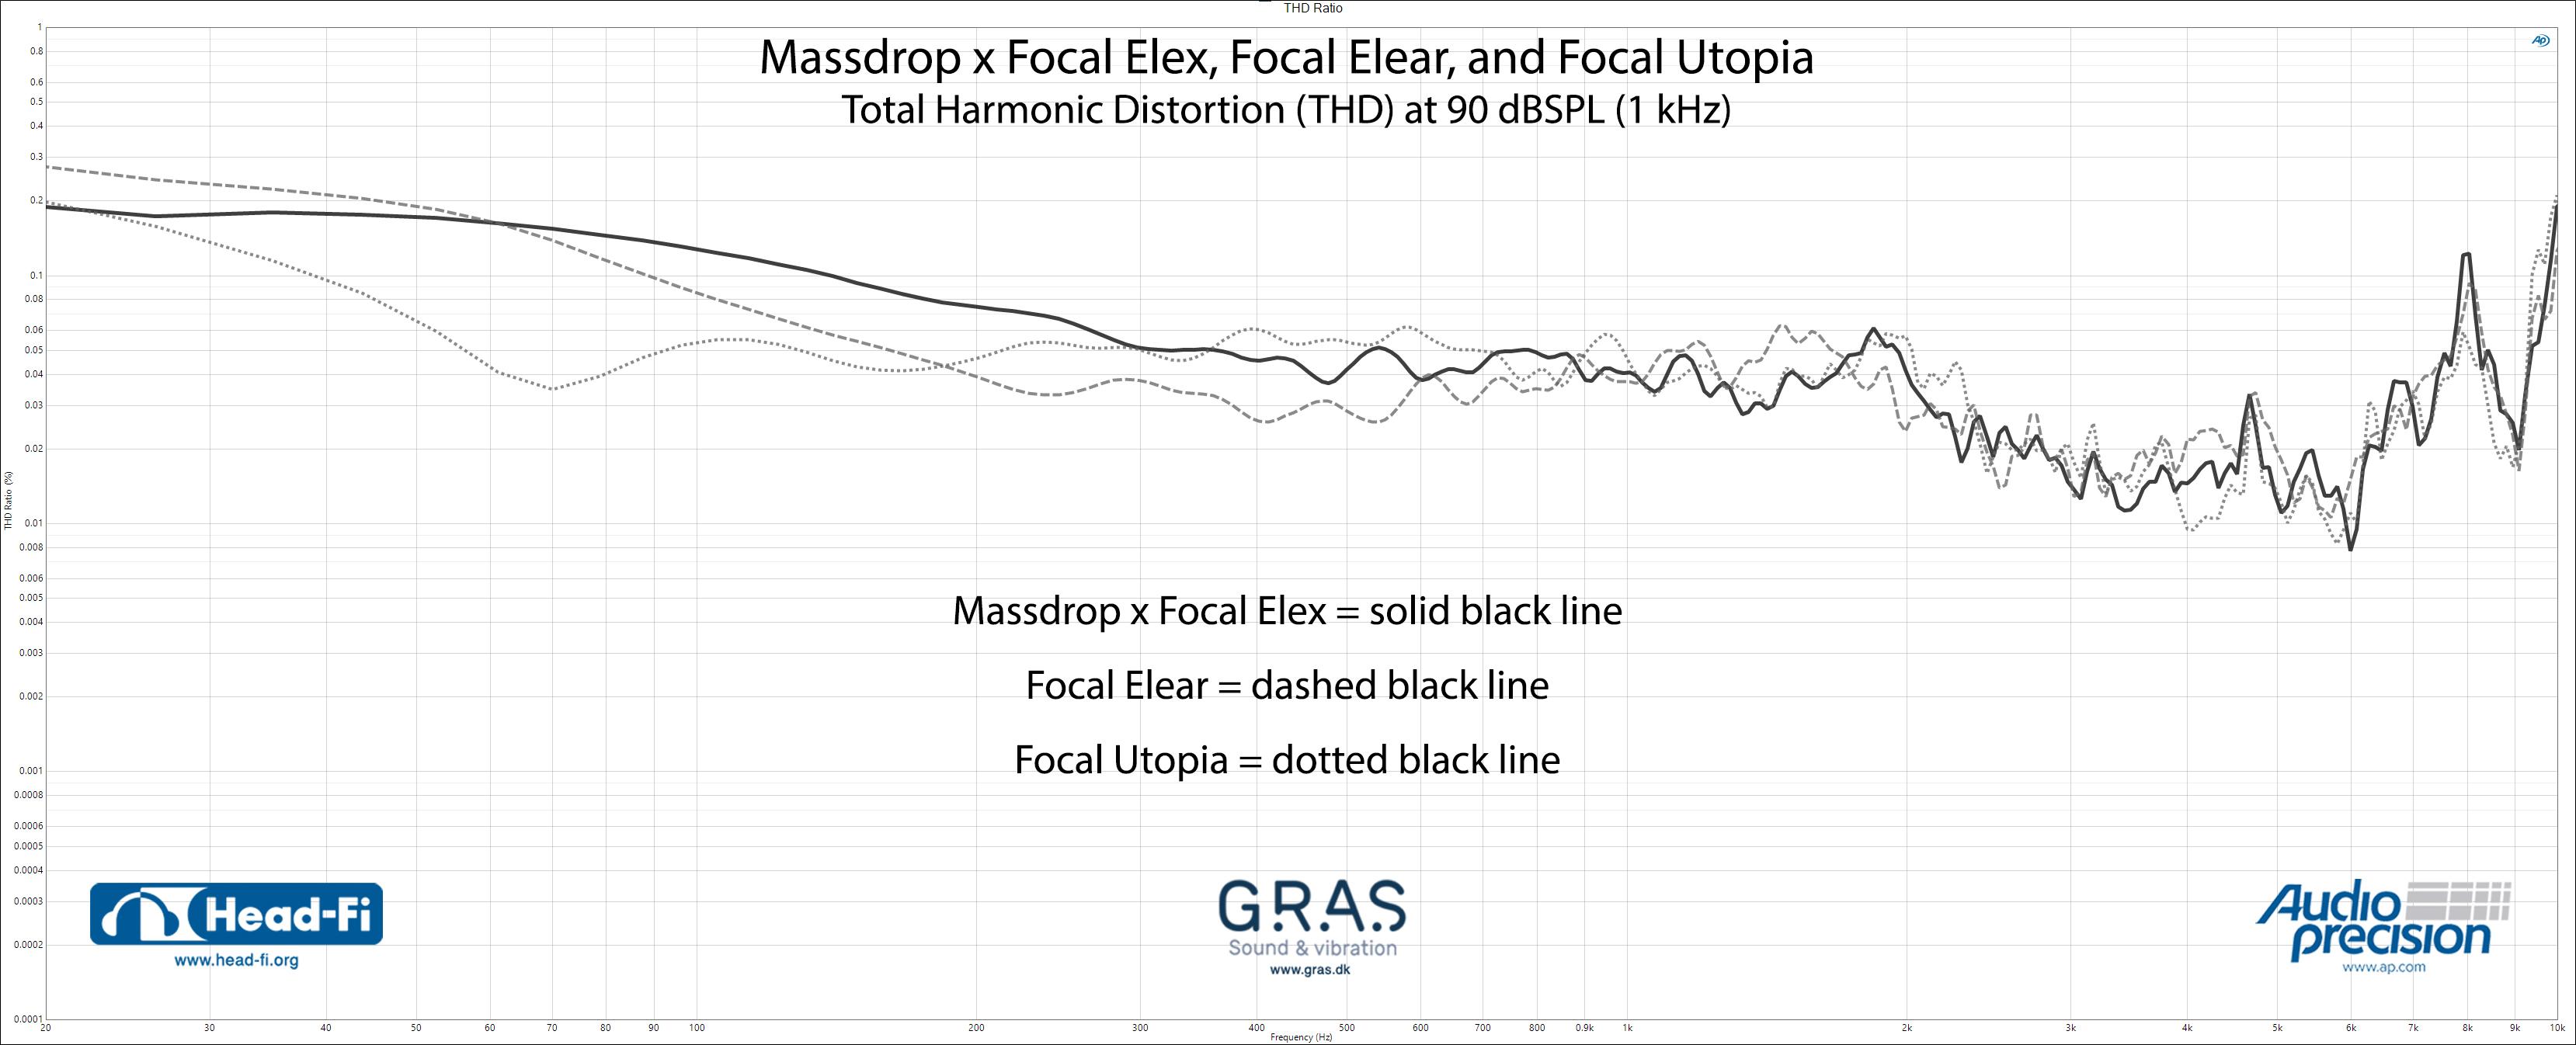 THD-Ratio_Massdrop-x-Focal-Elex_Focal-Elear_Focal-Utopia.jpg